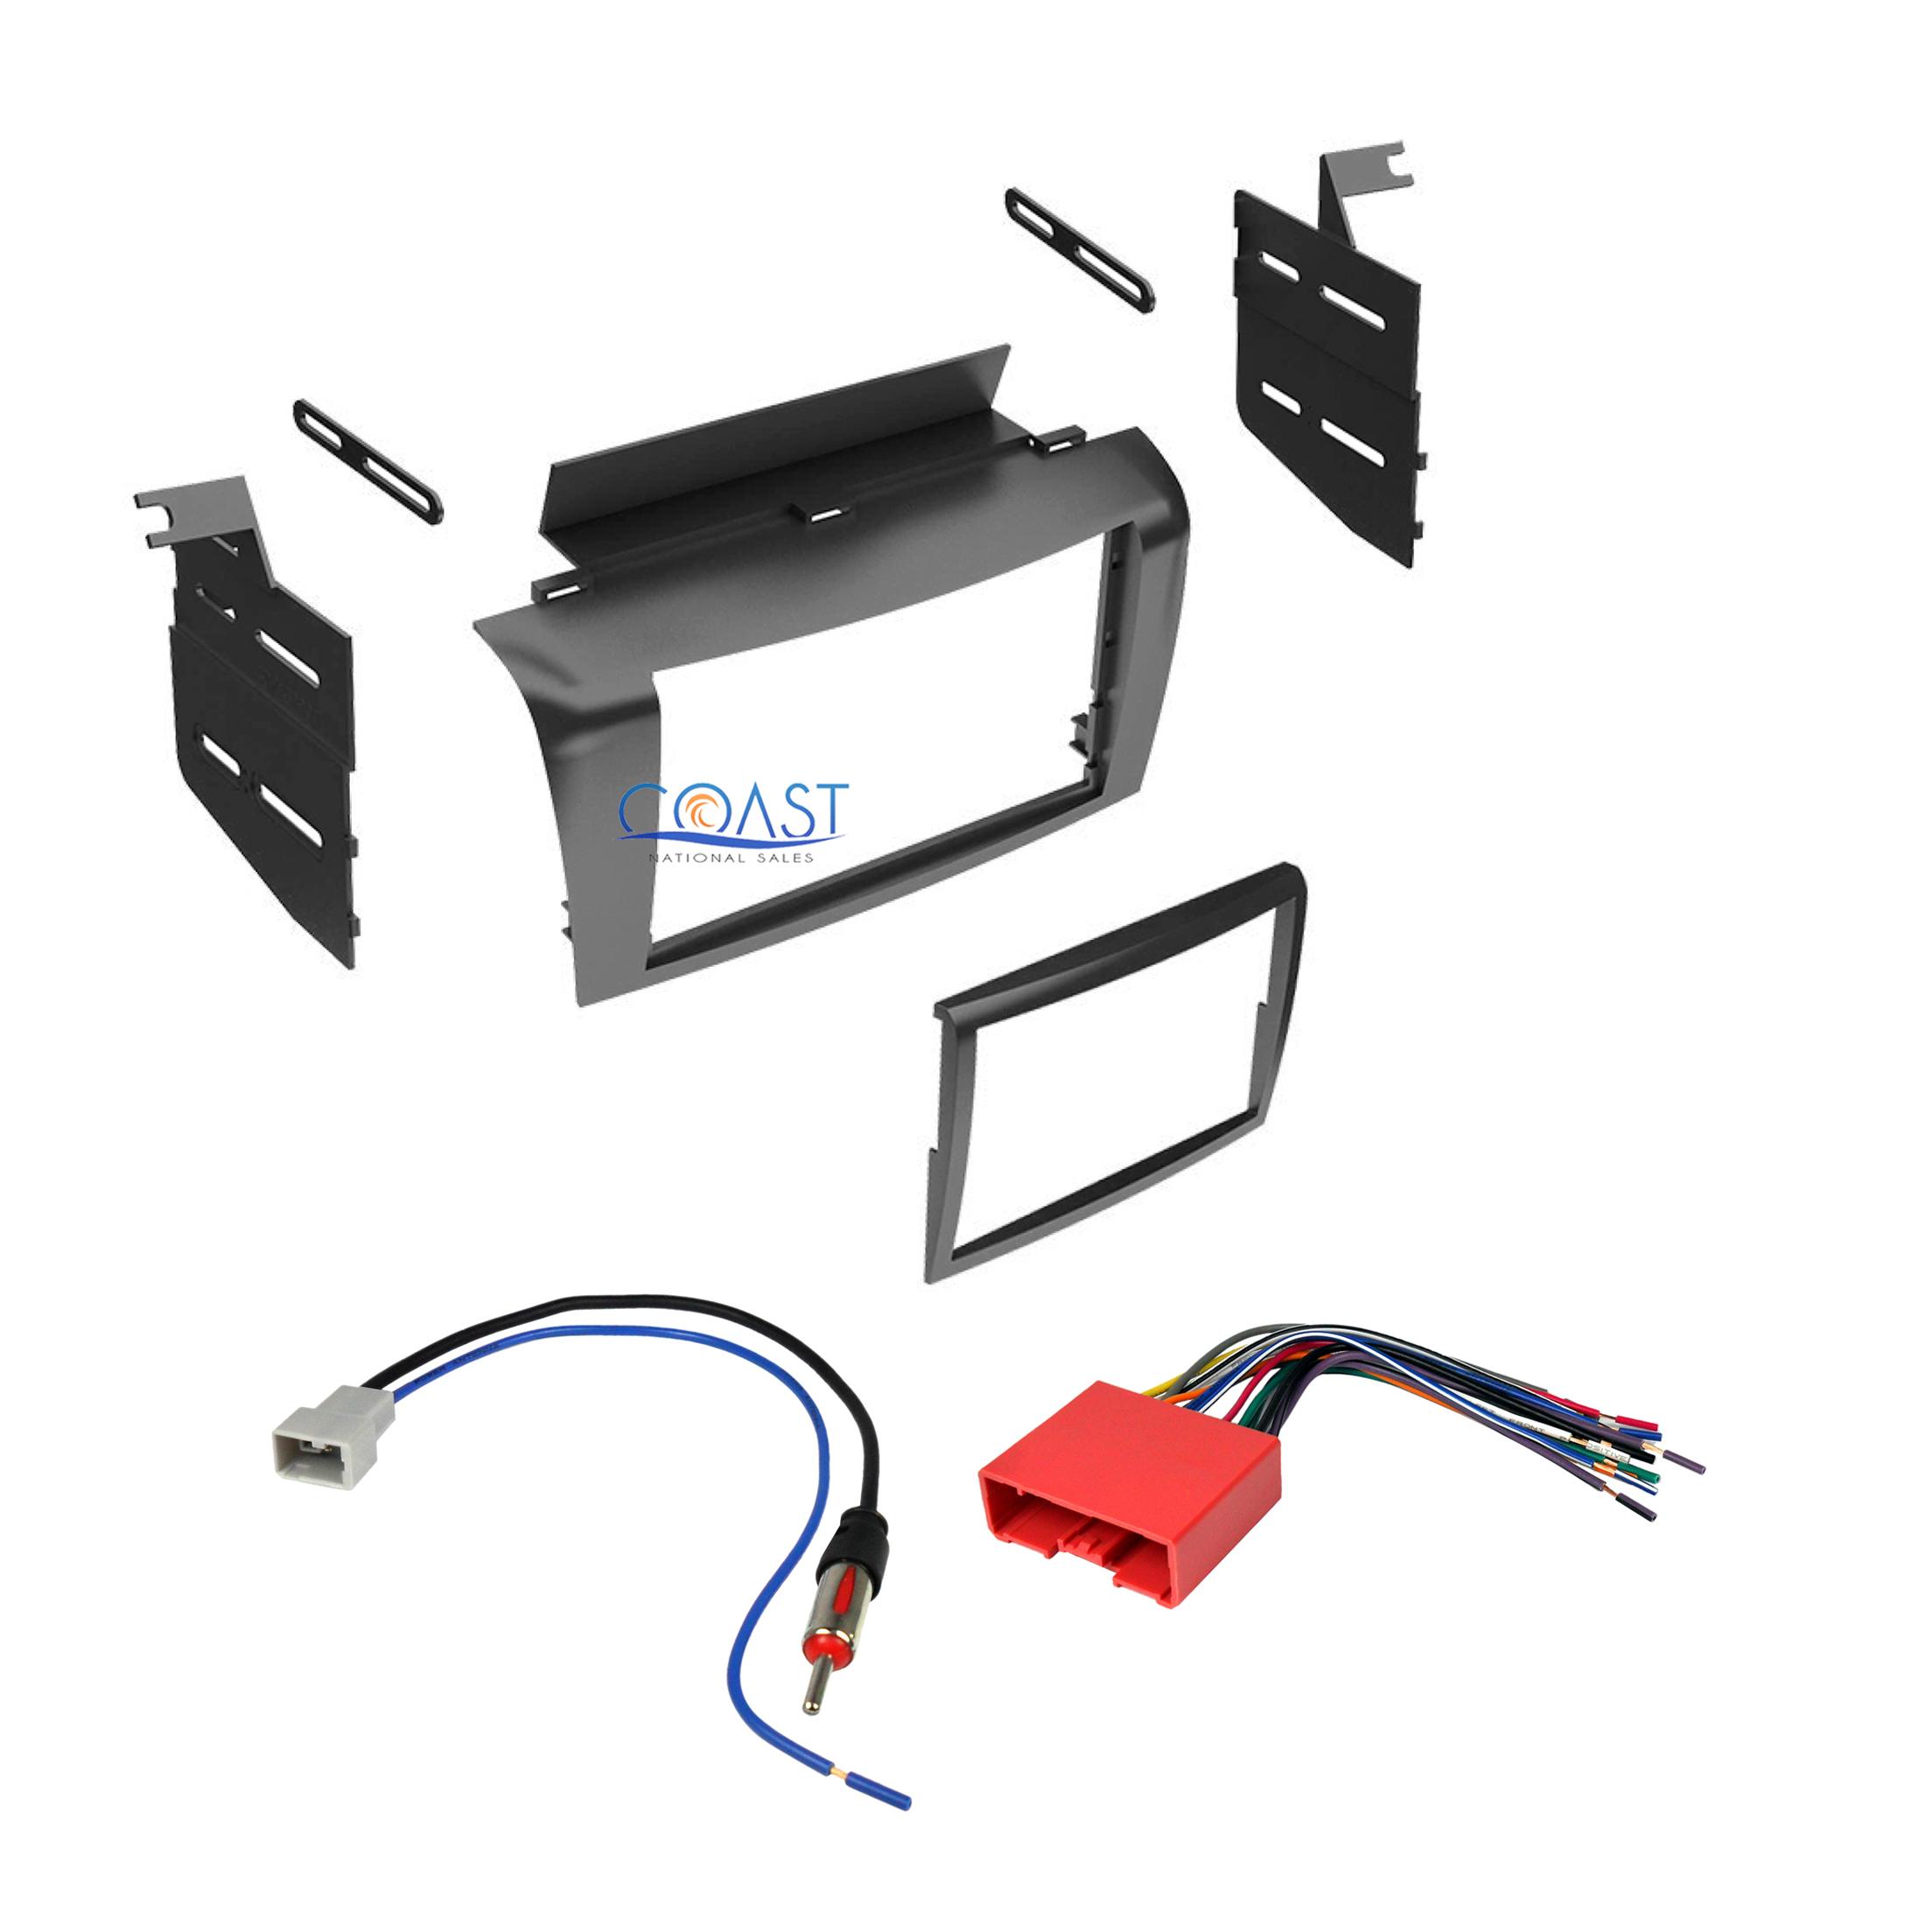 Double DIN Install Stereo Dash Kit + Harness + Antenna for 2004-2009 Mazda 3  | eBayeBay